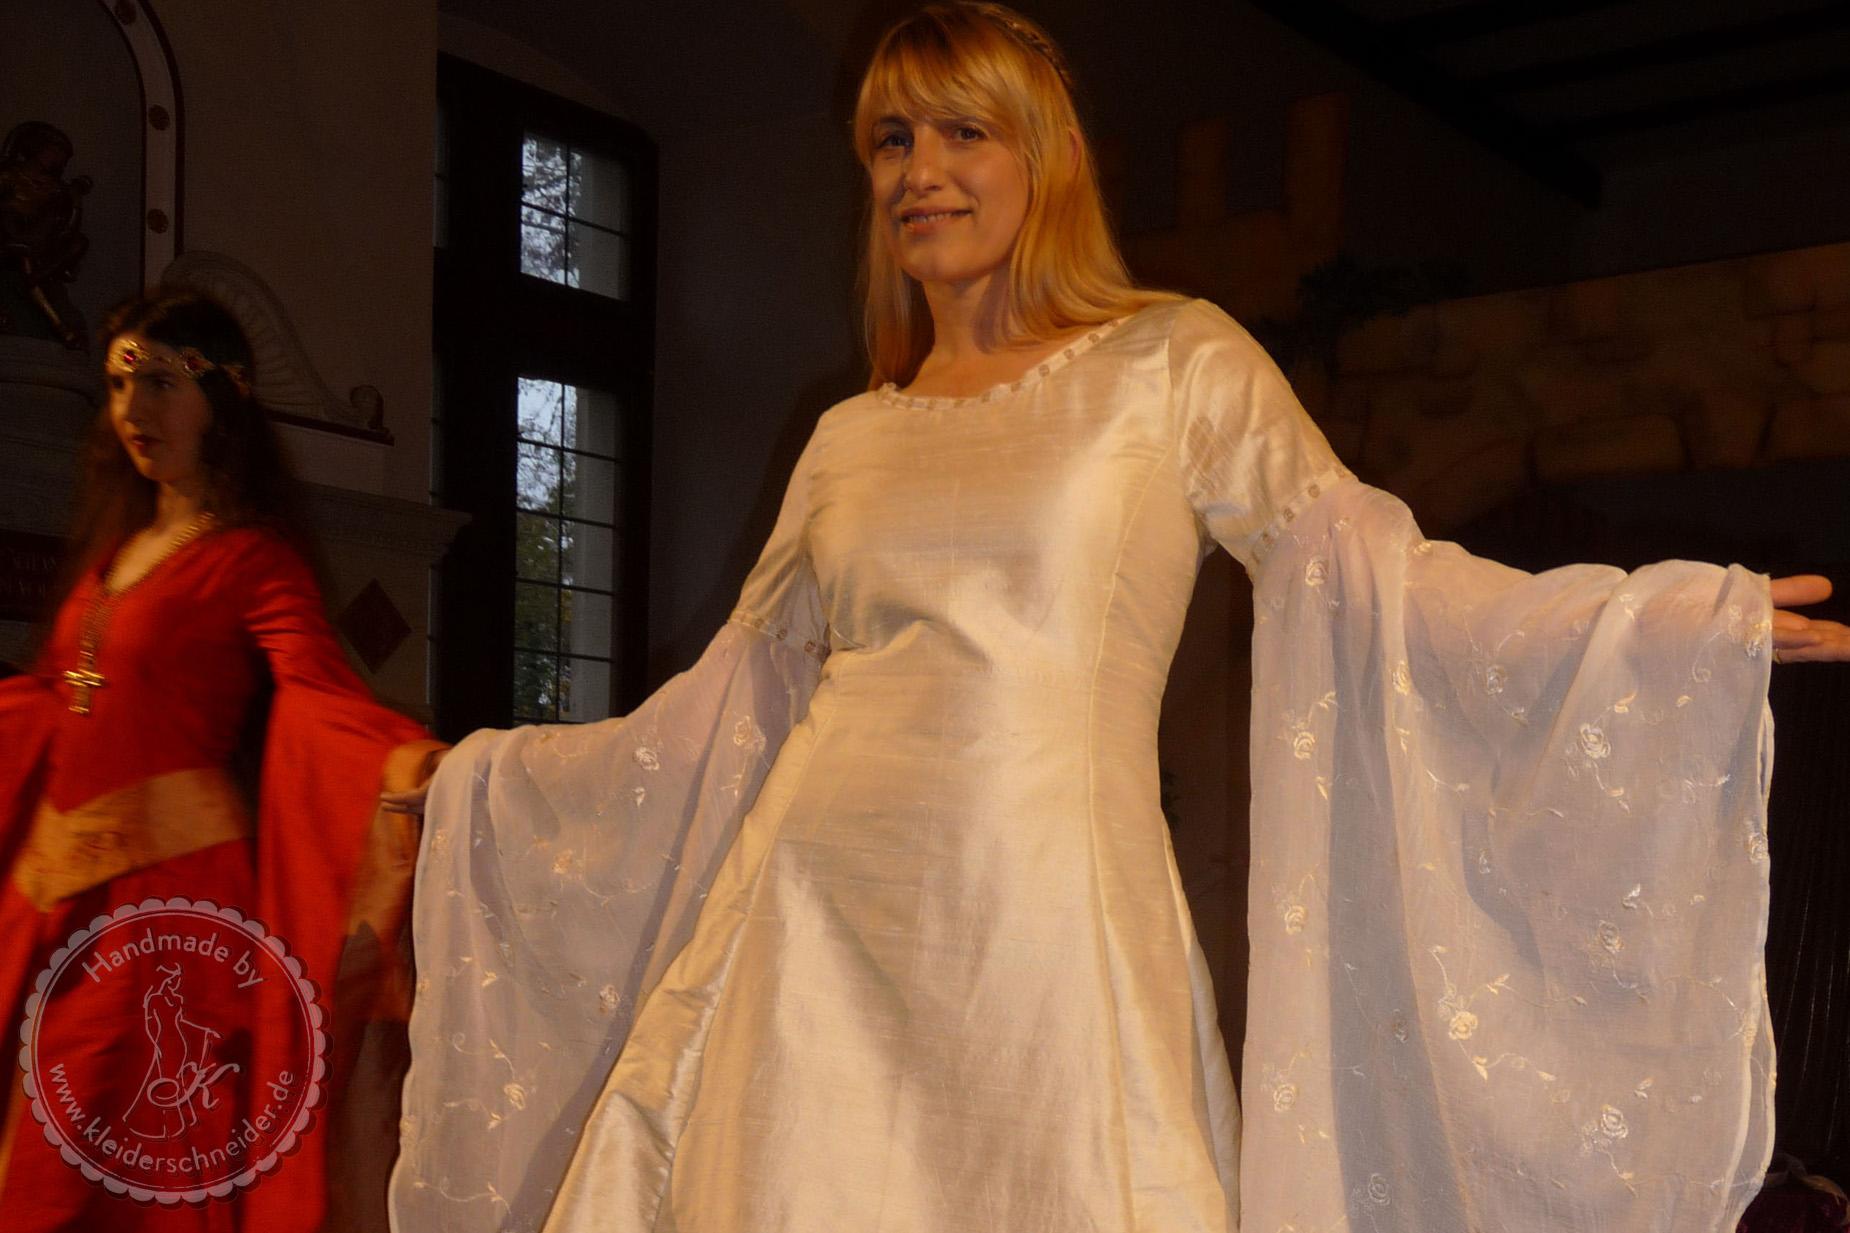 Feengleiches Brautgewand